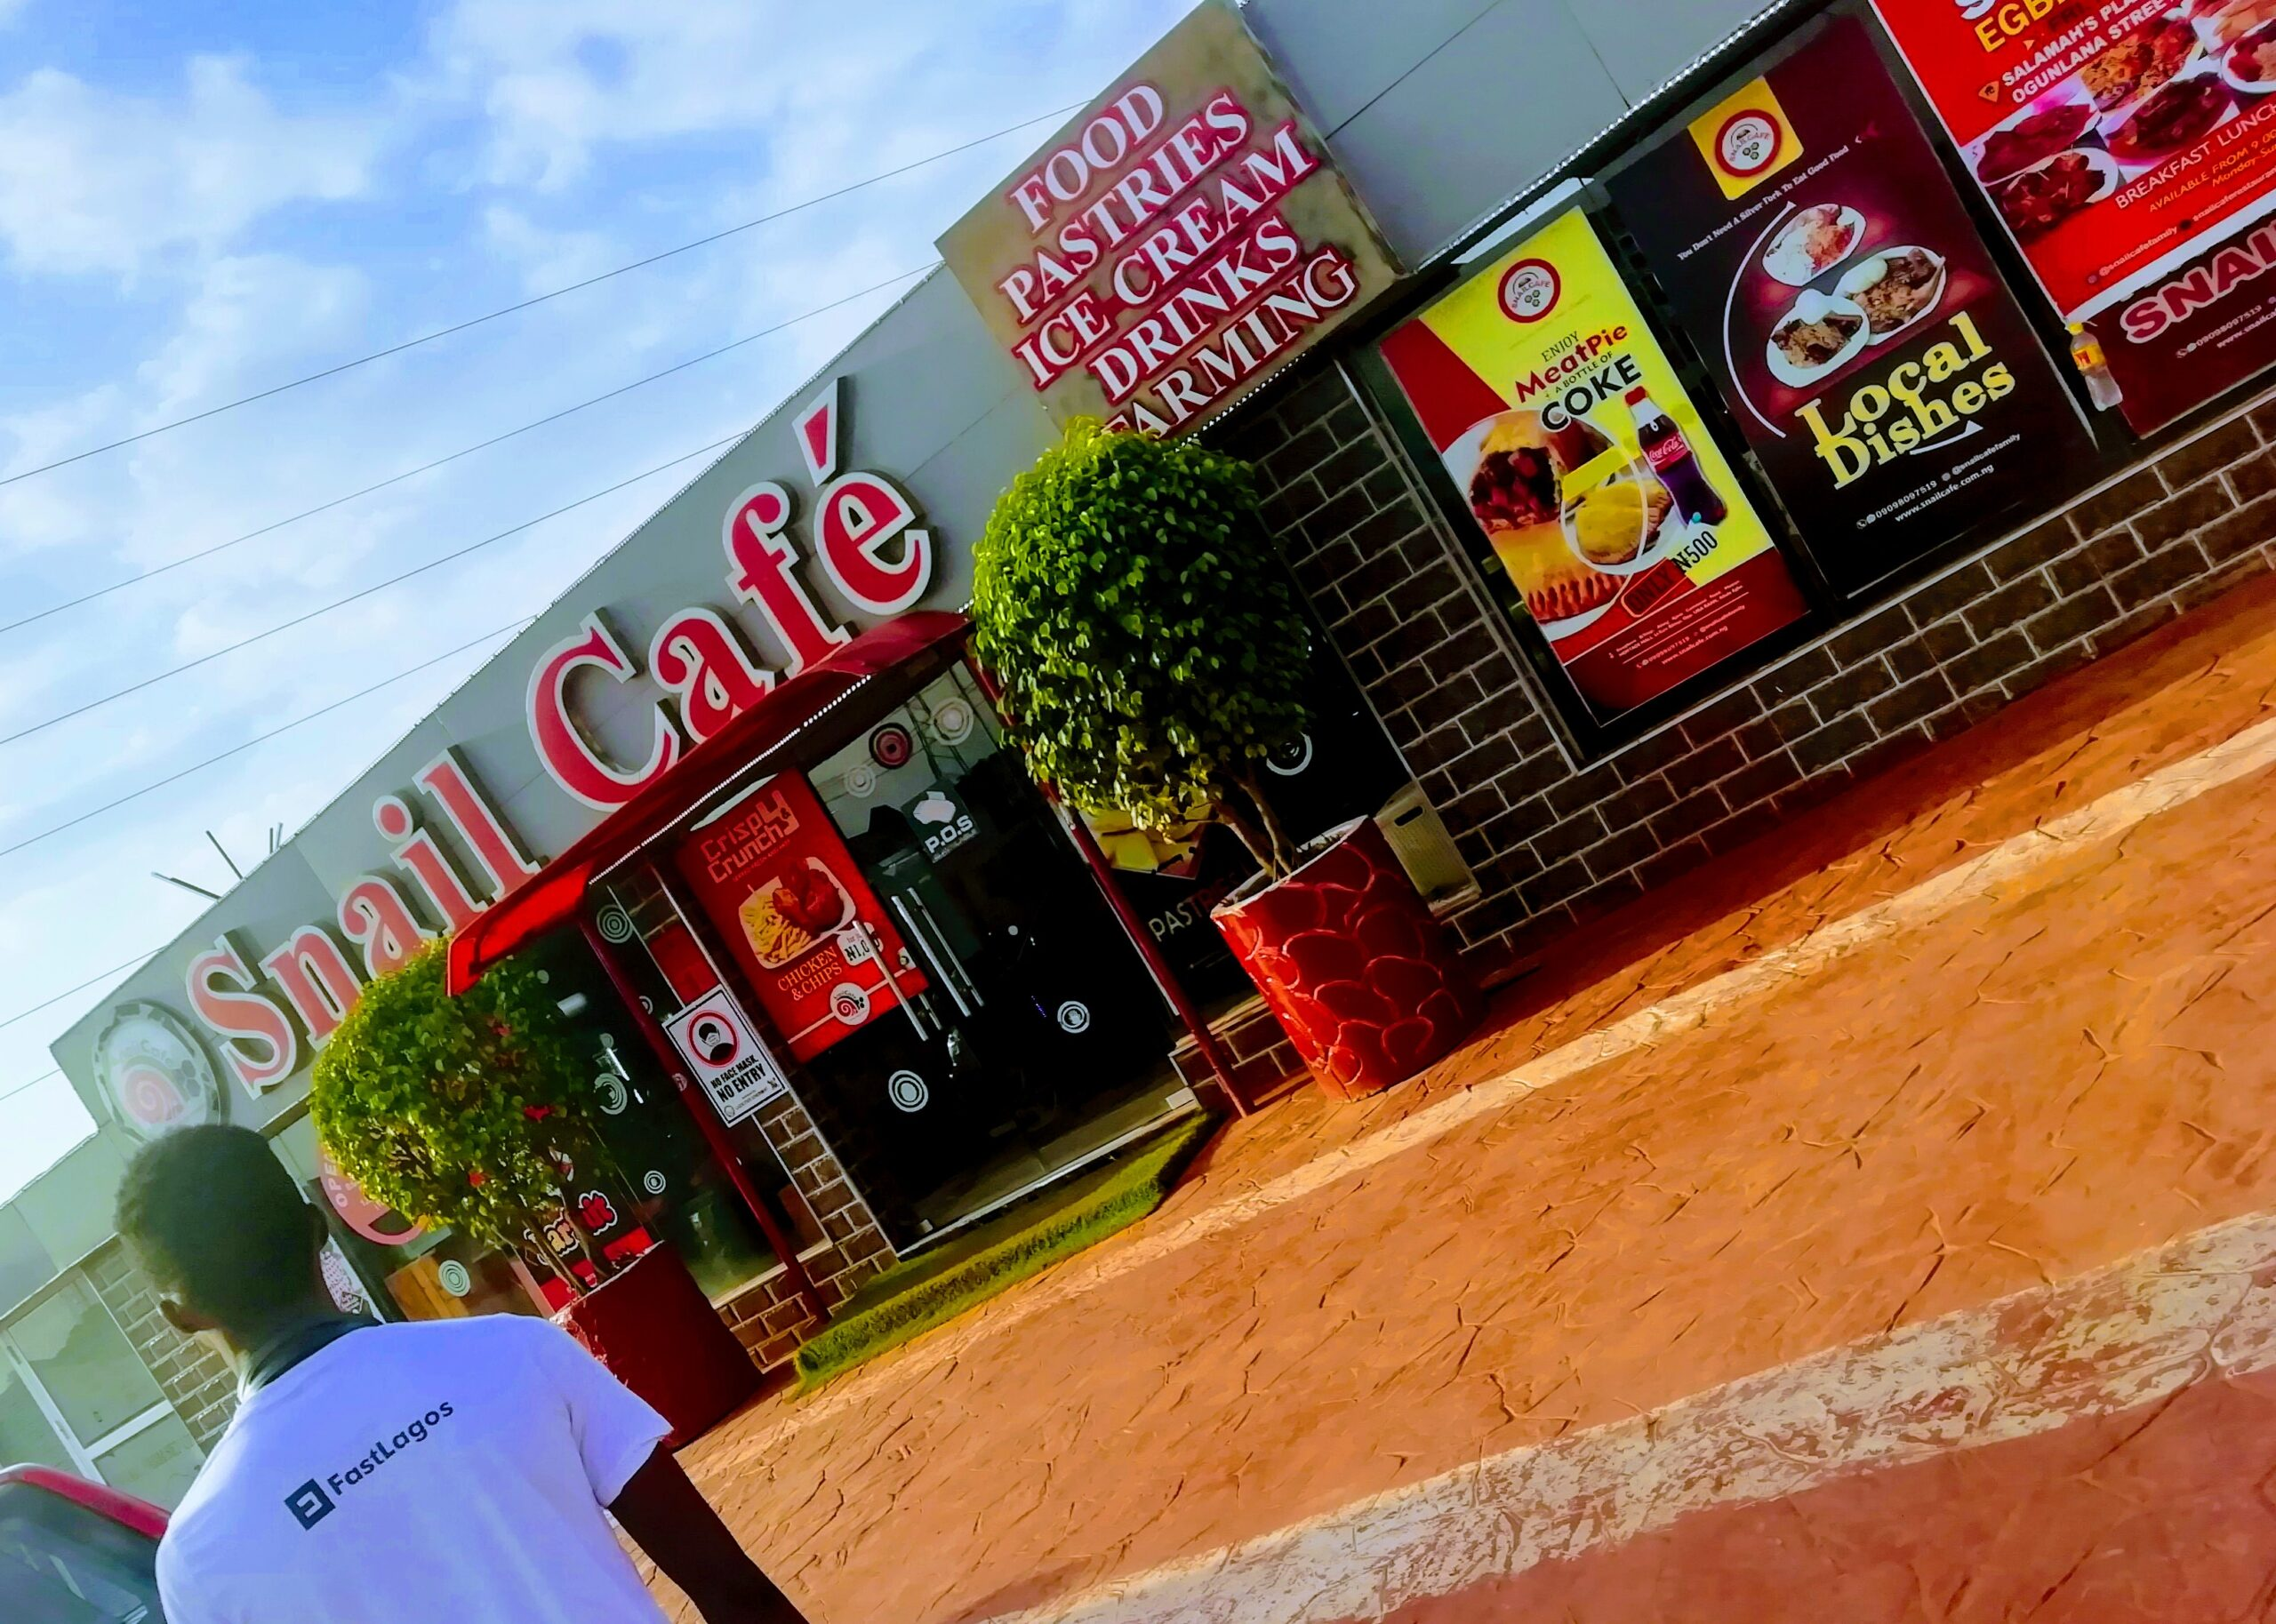 snail cafe restaurant